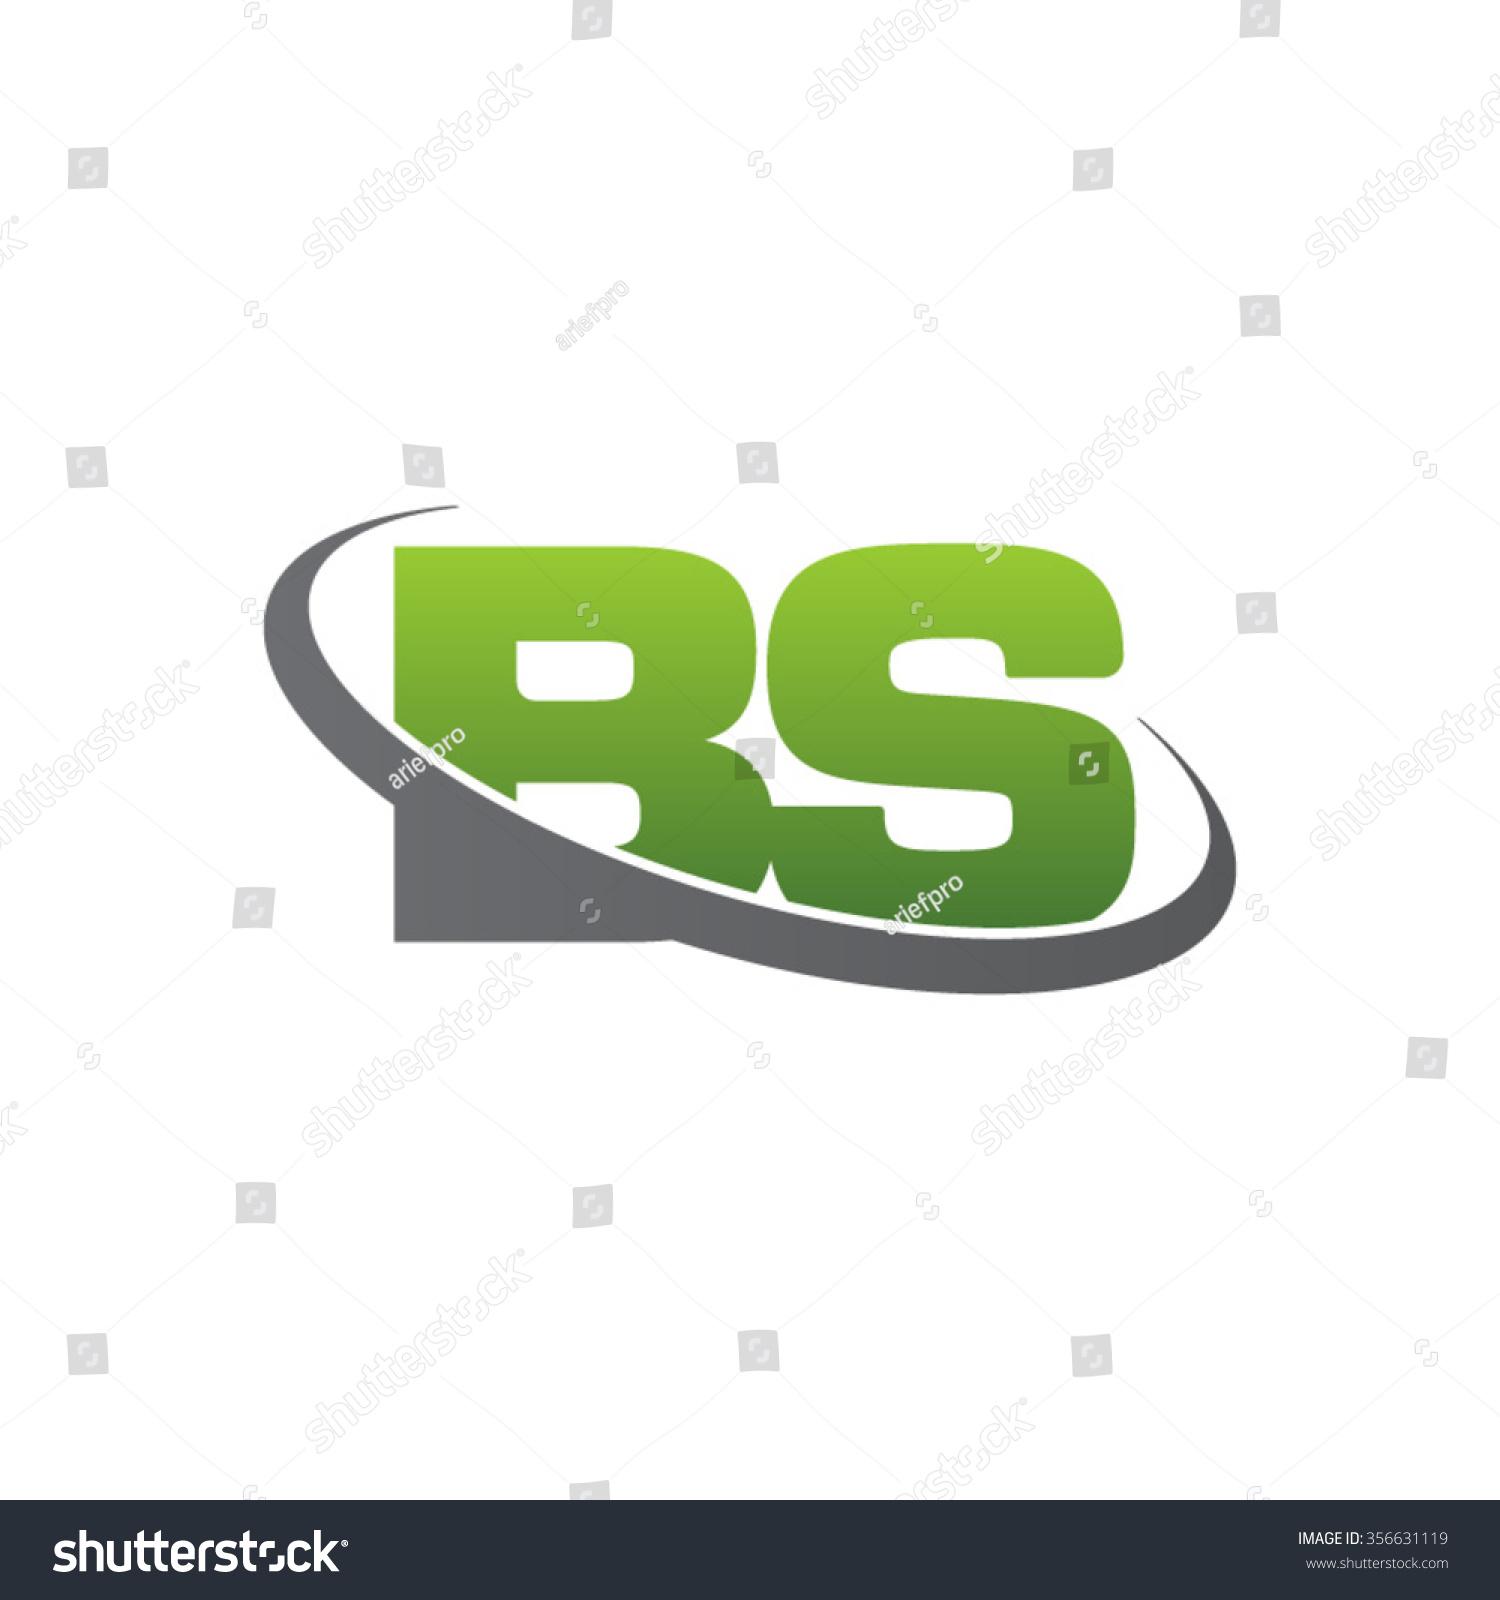 initial bs swoosh ring company logo green gray stock vector illustration 356631119 shutterstock. Black Bedroom Furniture Sets. Home Design Ideas